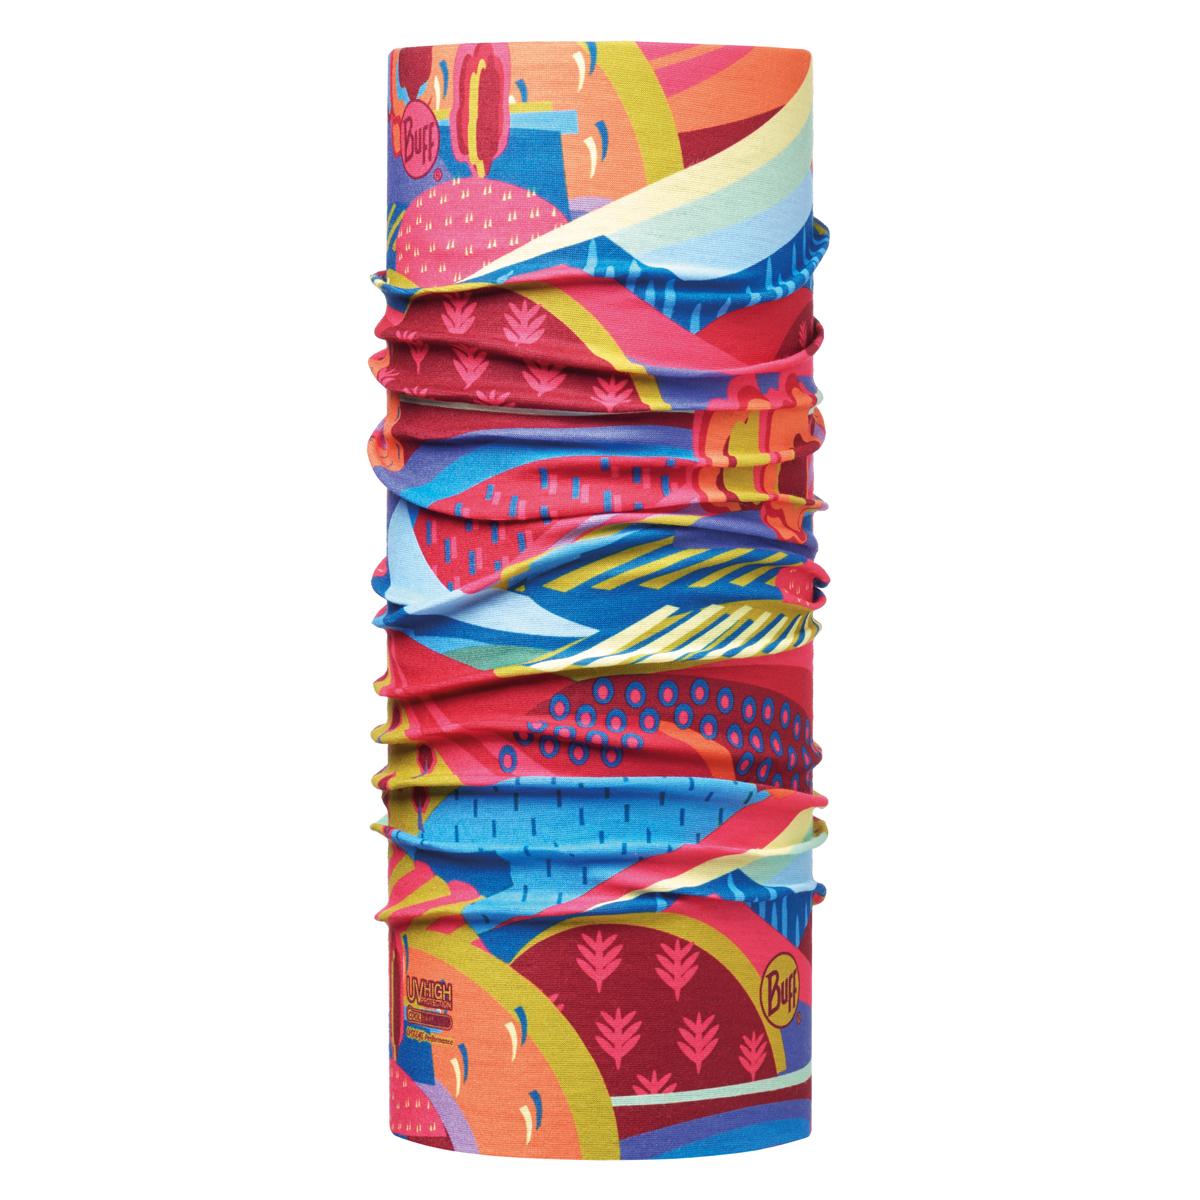 دستمال سر و گردن باف مدل COLOURFUL MOUNTAINS MULTI 115080-555-10